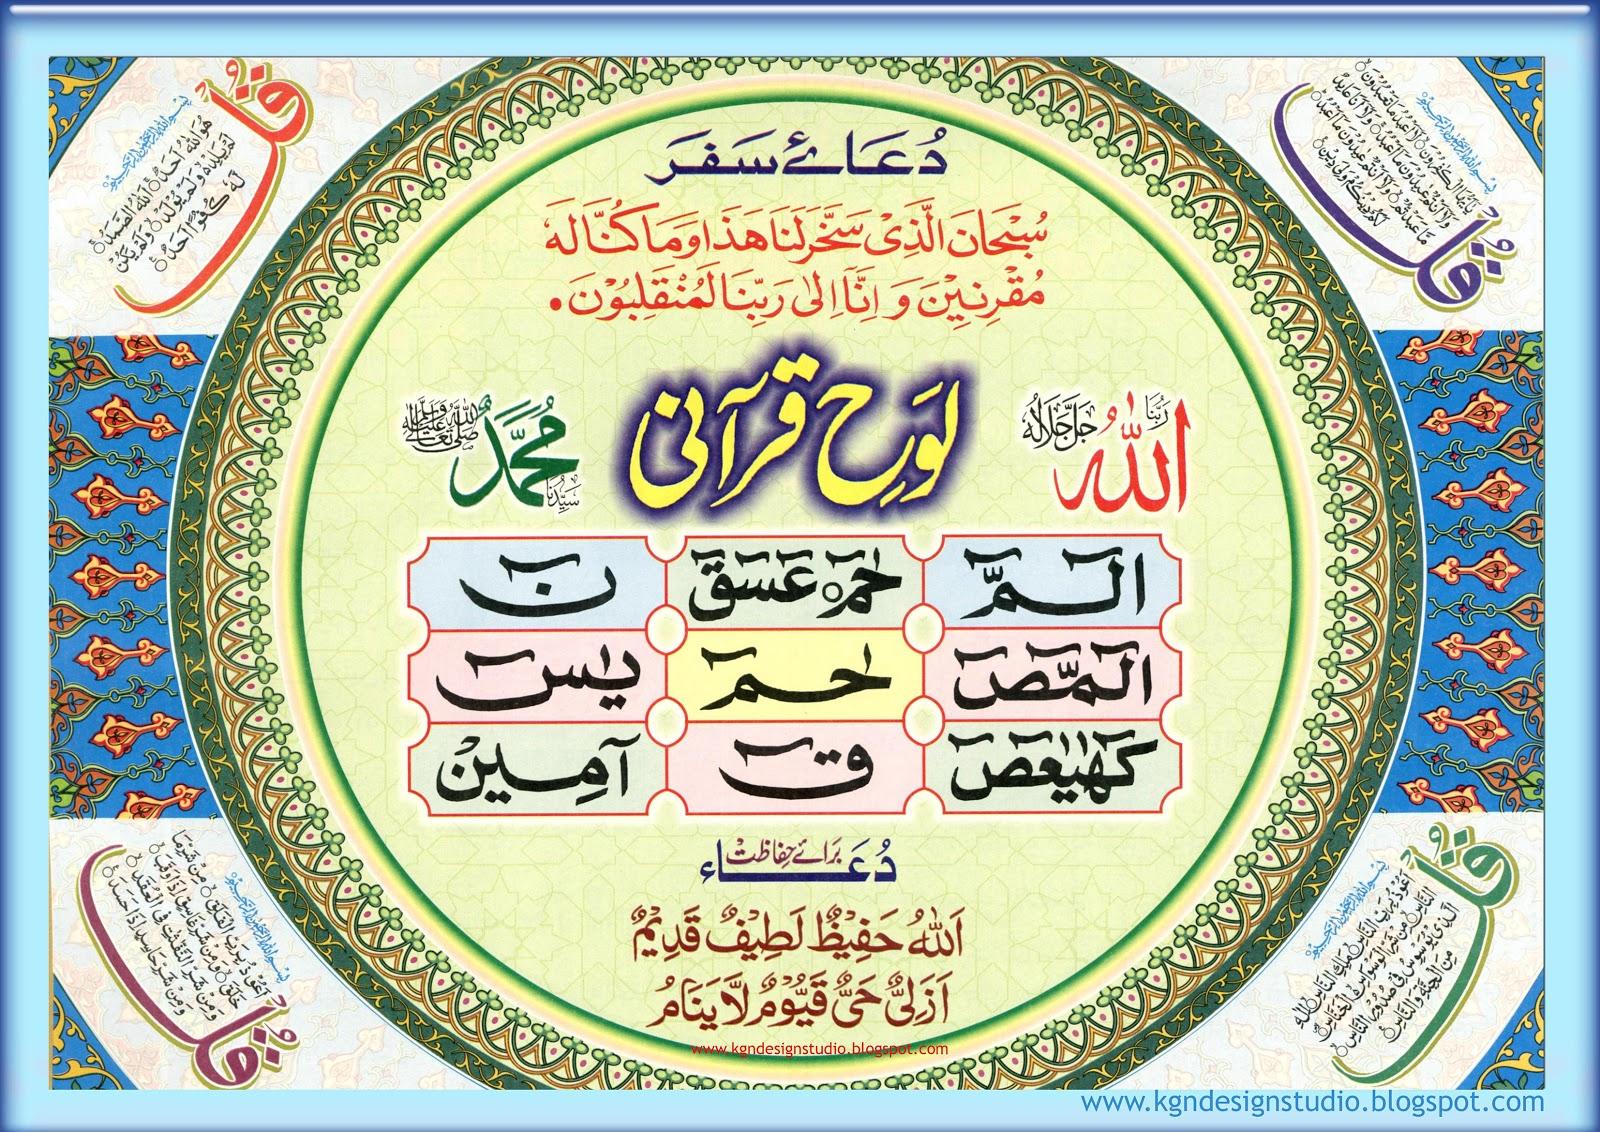 http://1.bp.blogspot.com/-QgJPDwwFQSY/UObiYP8jPMI/AAAAAAAACSo/CbmGYbV62sI/s1600/Eid-e-Milad-Wallpaper-16.jpg